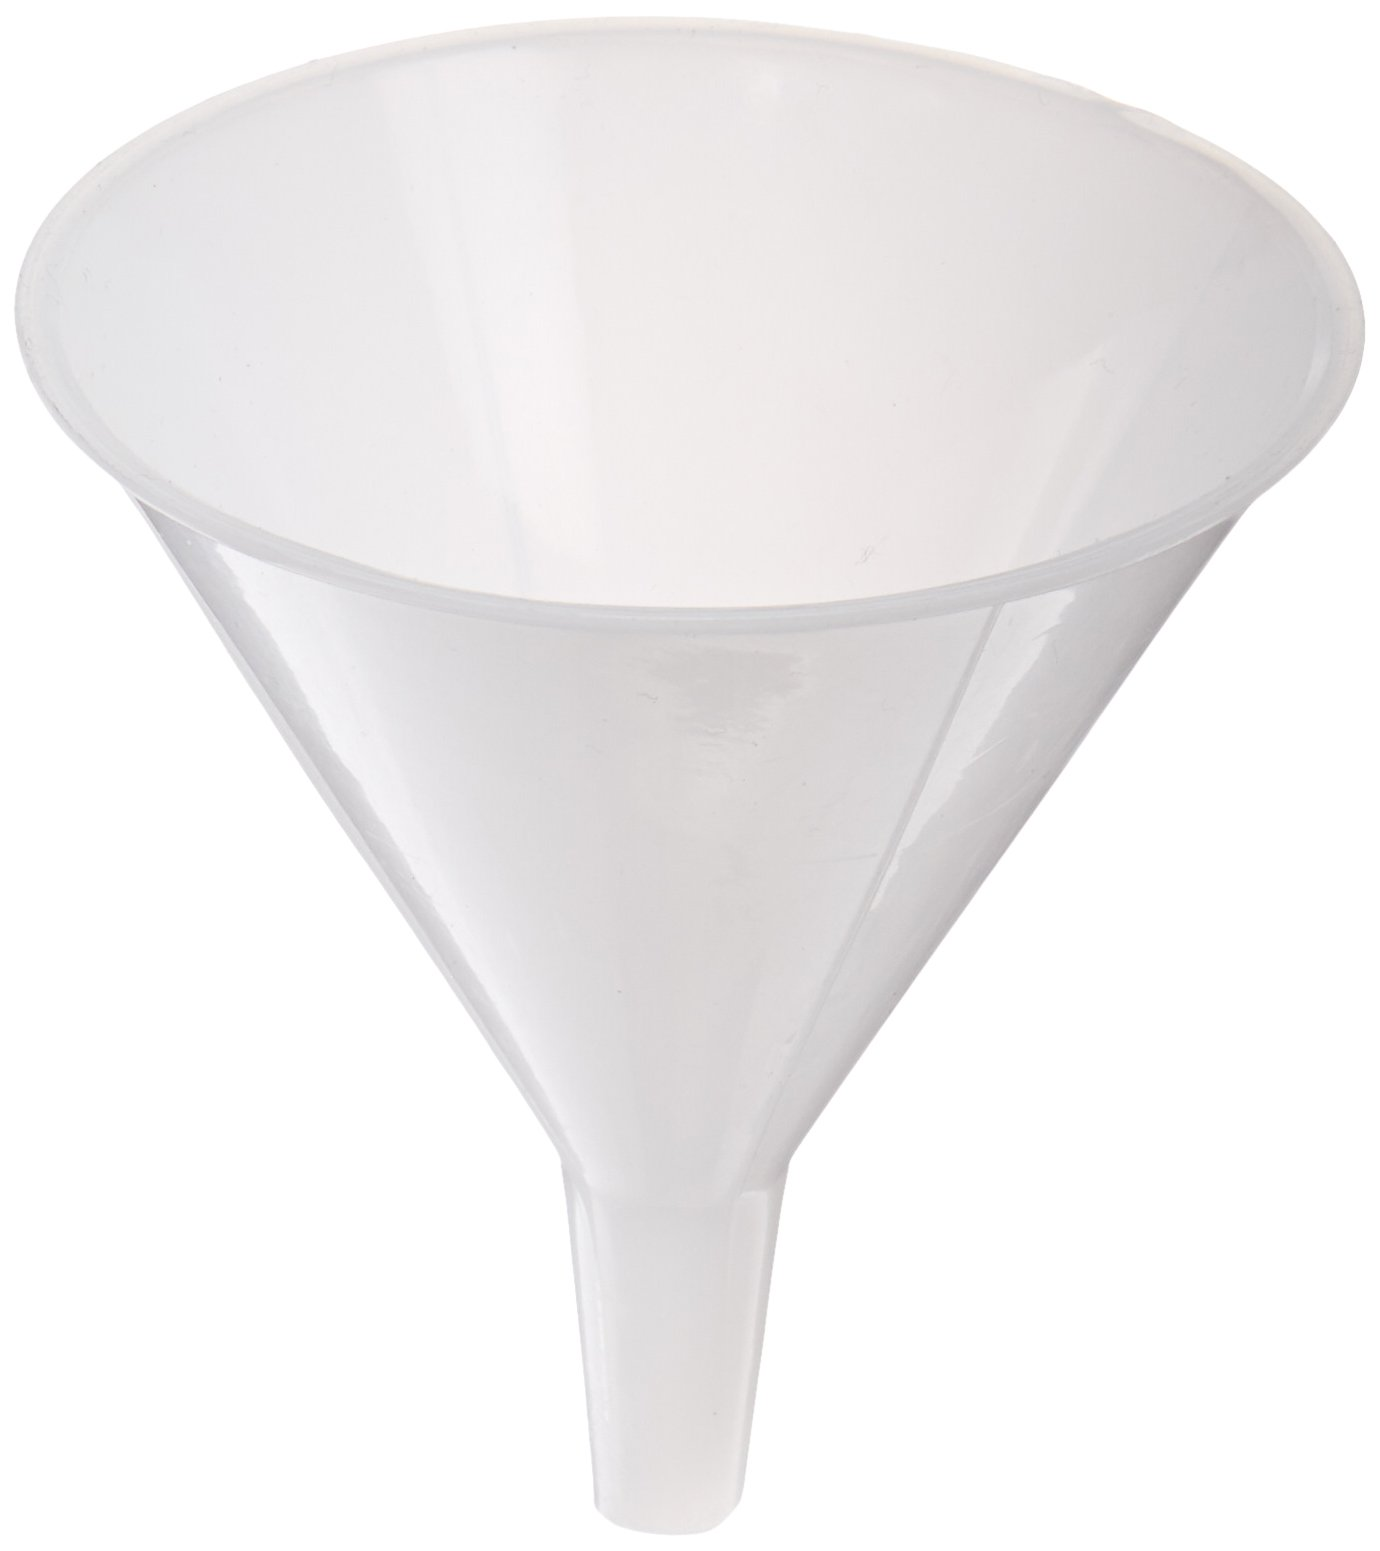 United Scientific FHD185 High Density Polyethylene Clear Short Stem Funnels, 85ml Capacity (Pack of 12)